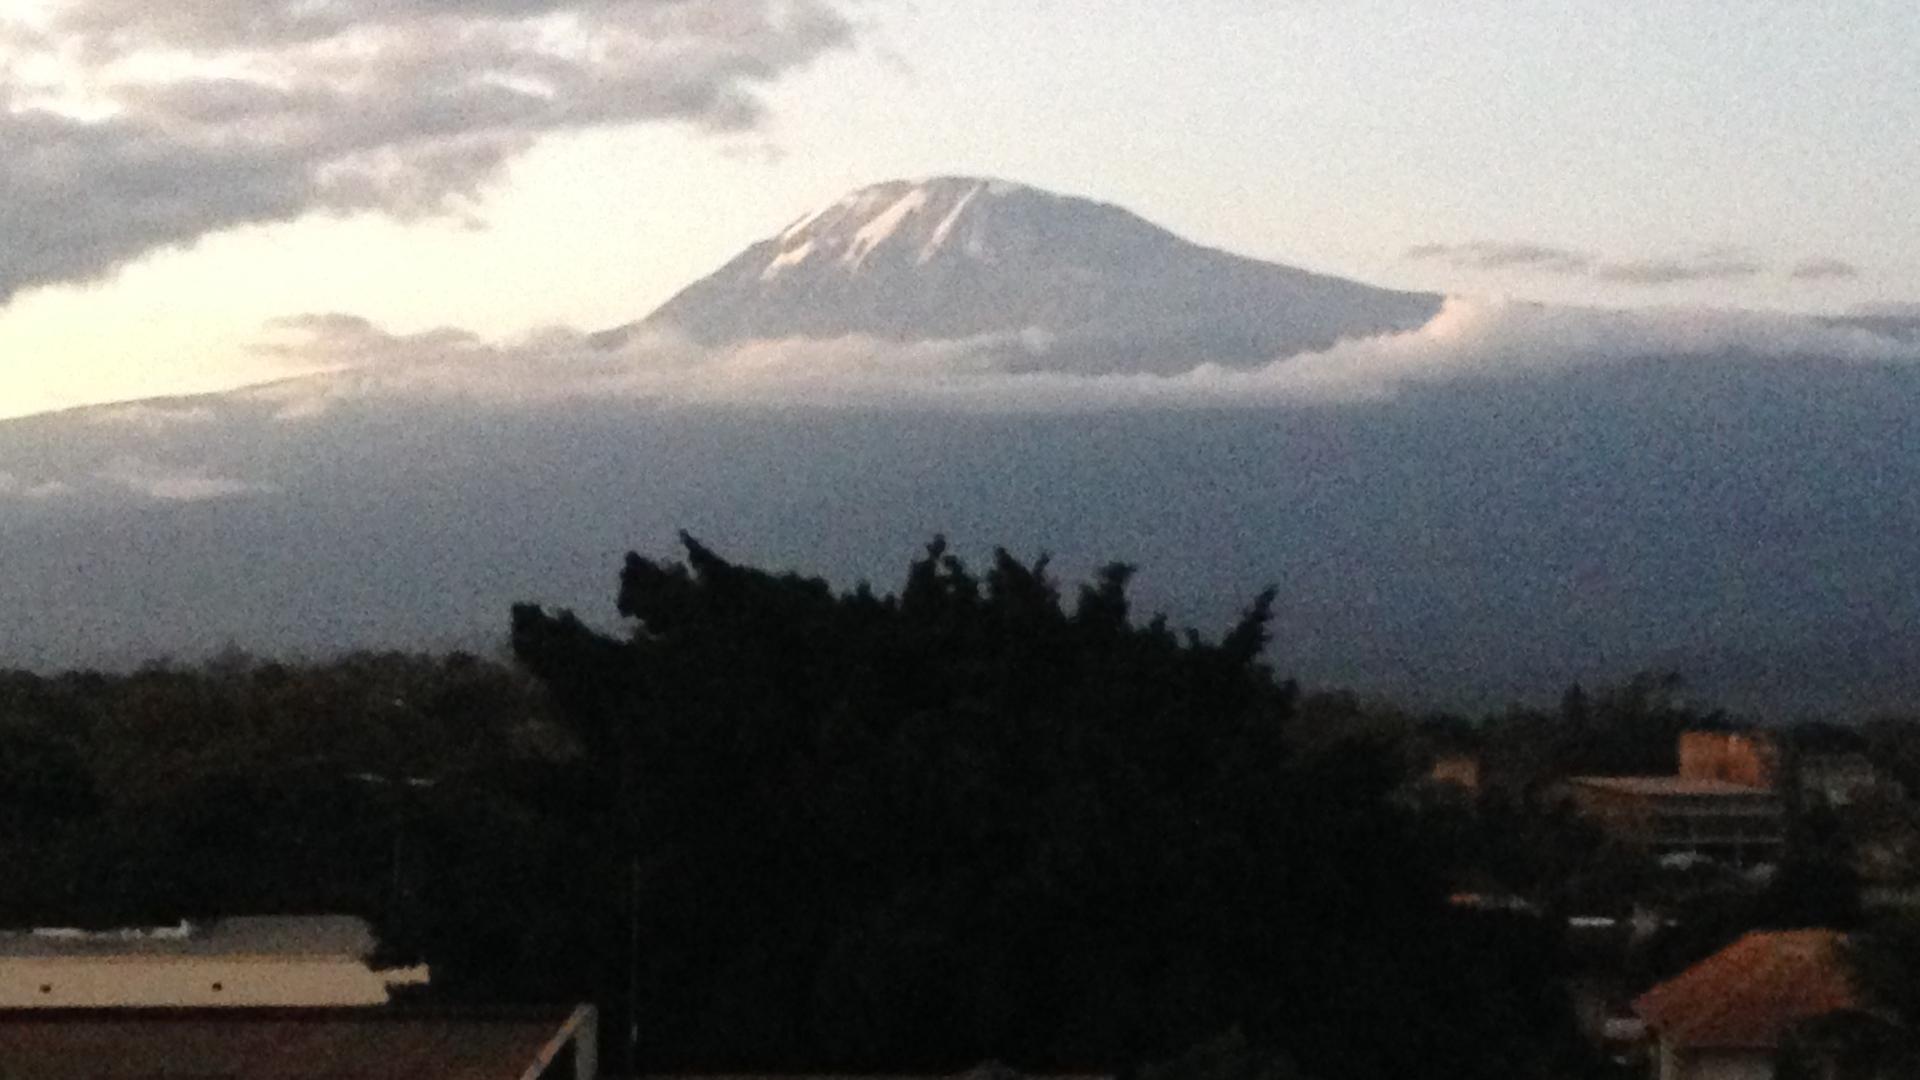 Vue du Kilimandjaro de la ville de Moshi